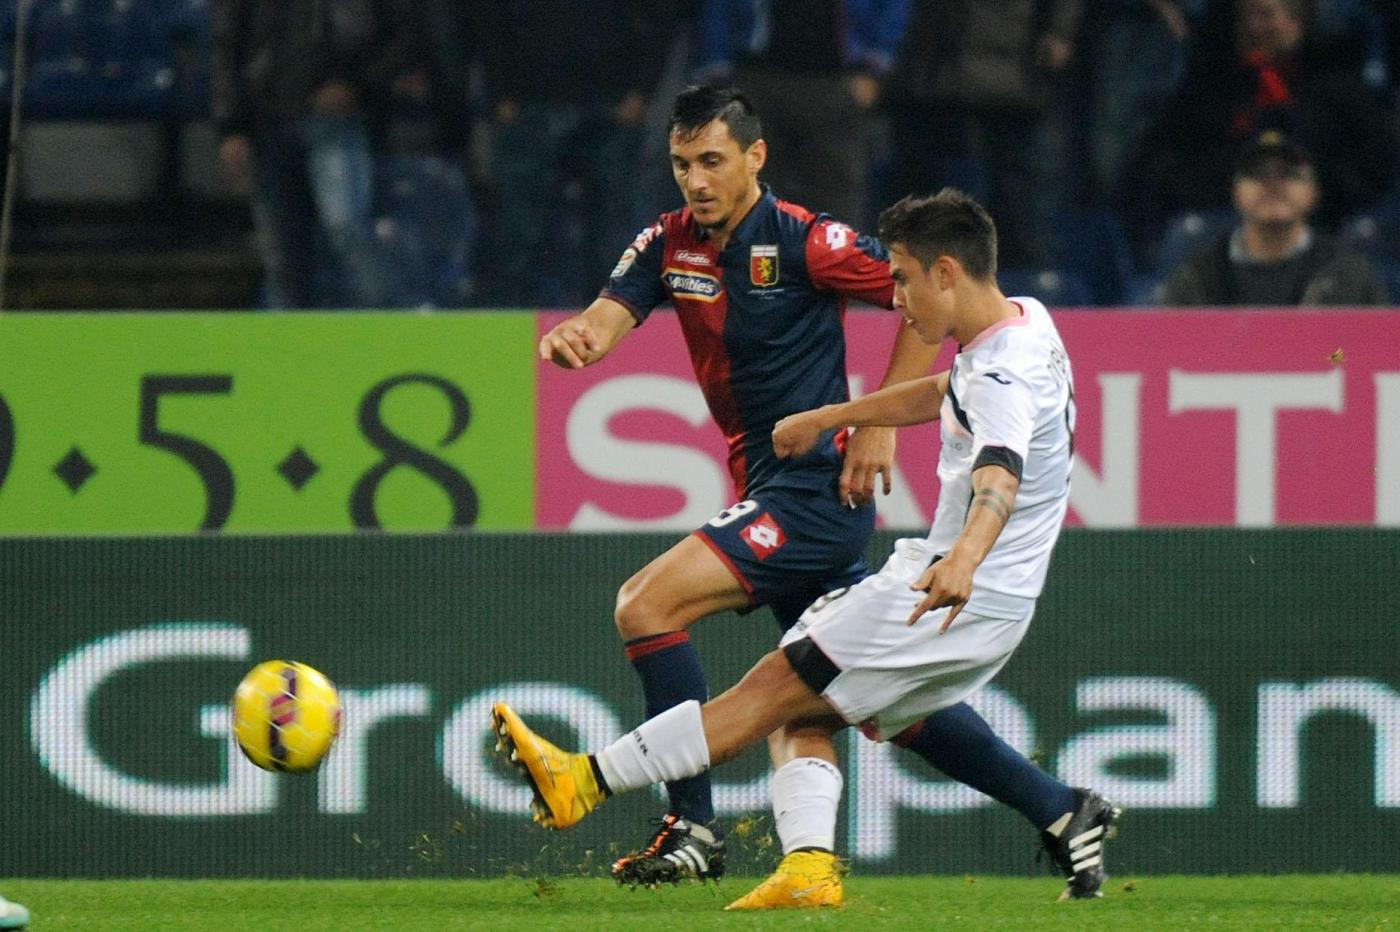 Ponturi Fotbal – Palermo vs Genoa – Serie A